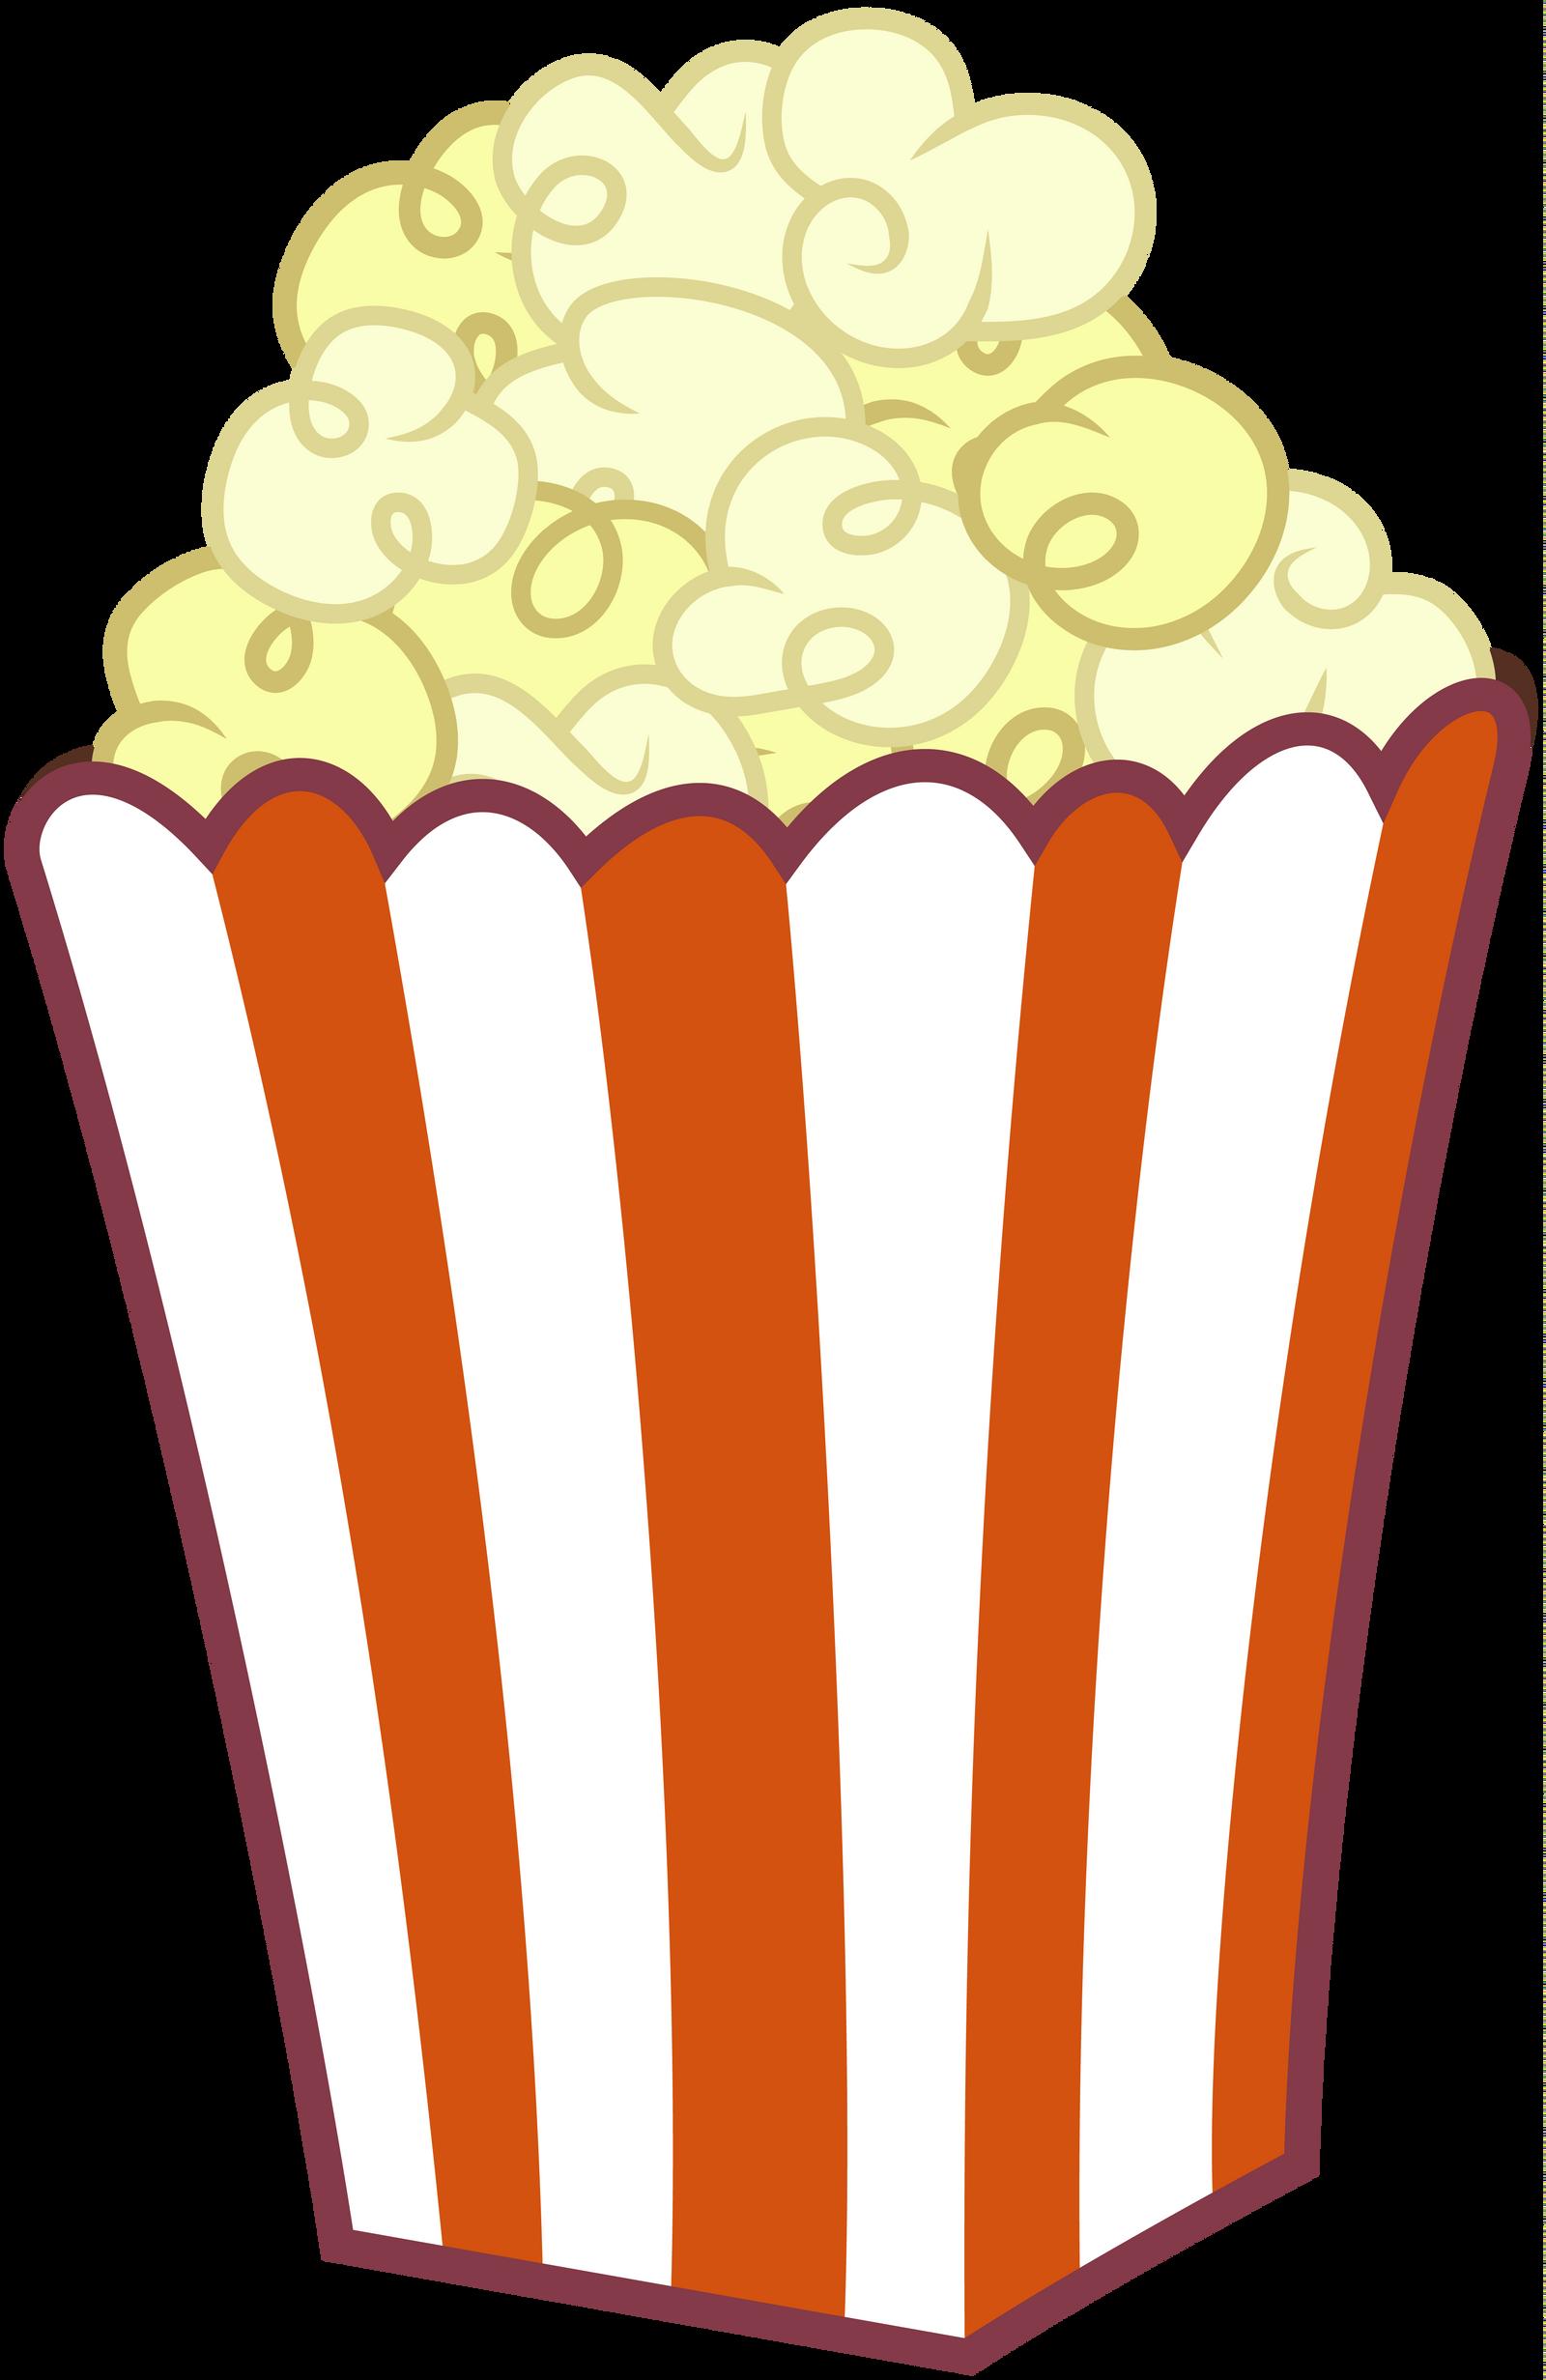 MLP Resource: Bag of Popcorn by Lahirien on DeviantArt